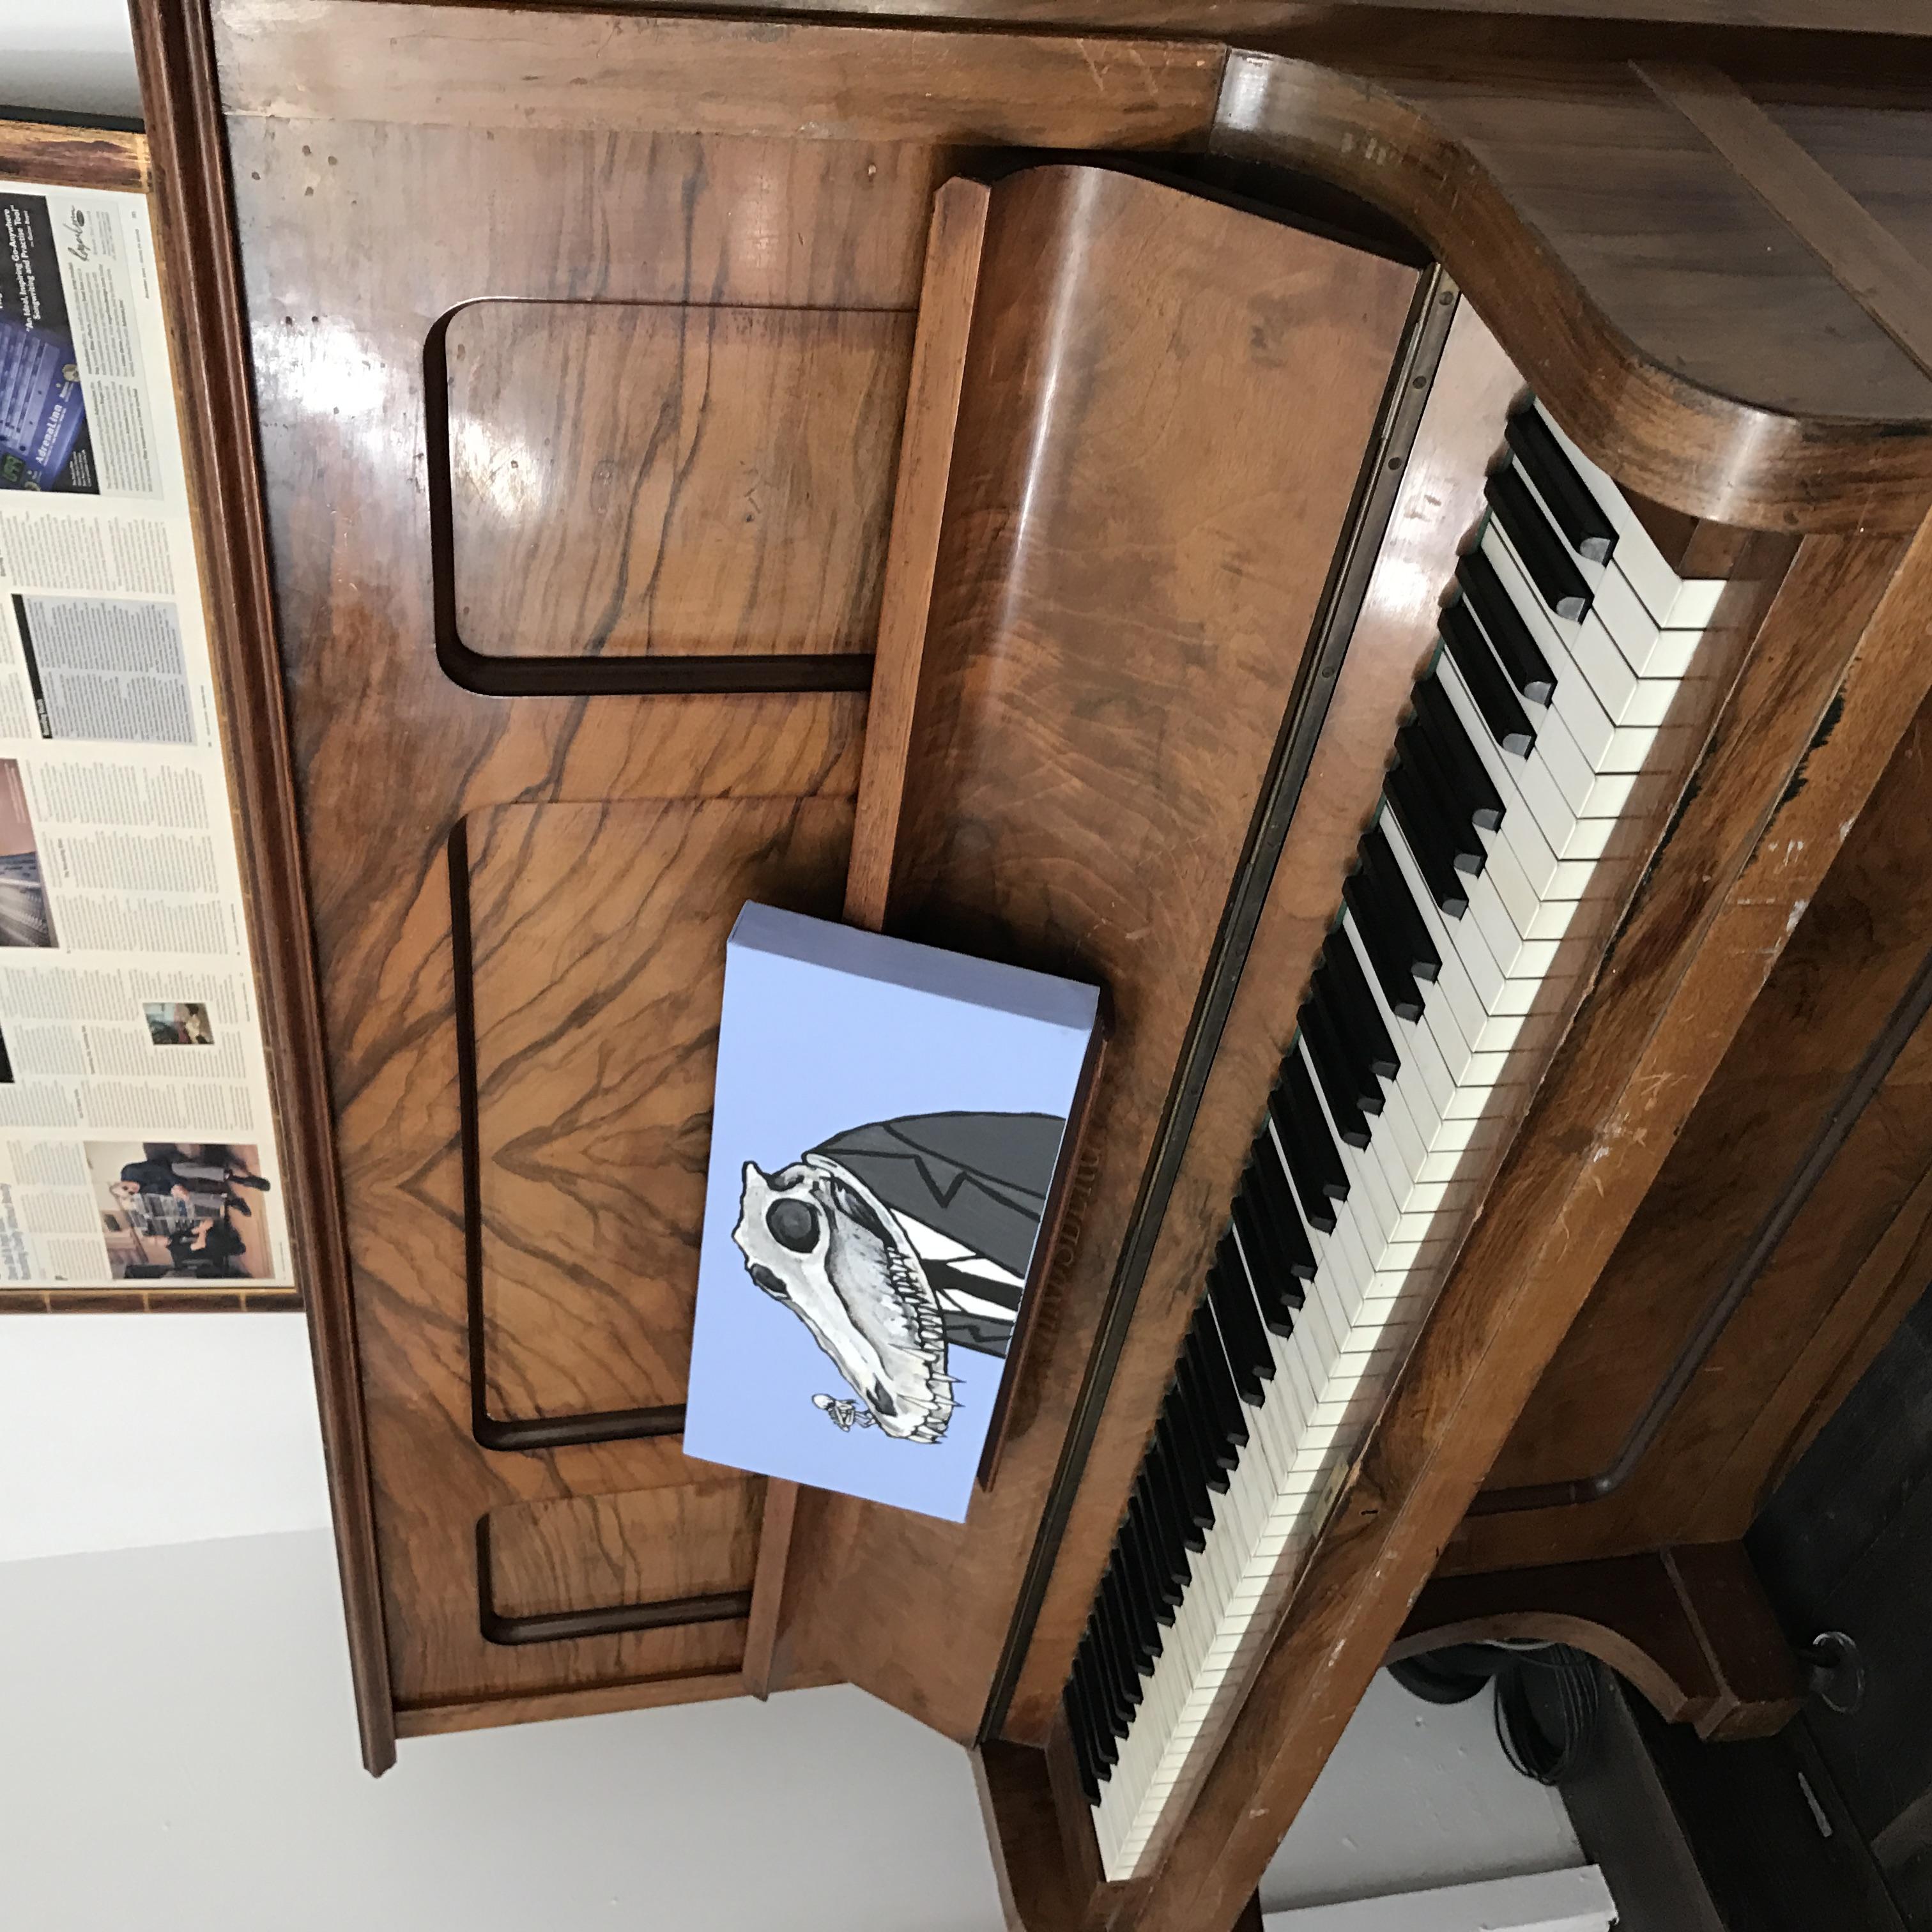 Piano in Studio 2 Lounge